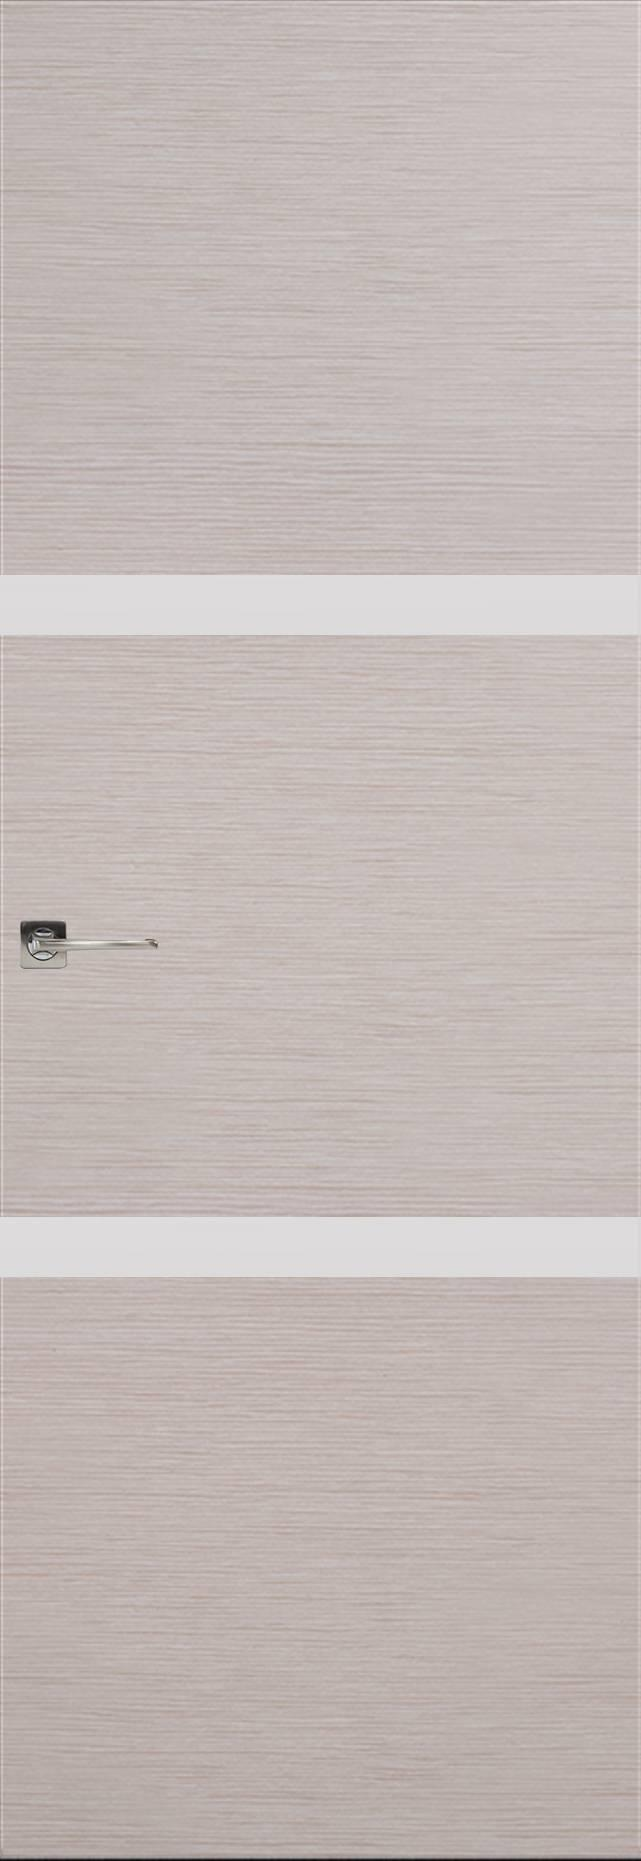 Tivoli В-4 Invisible цвет - Дымчатый дуб Без стекла (ДГ)